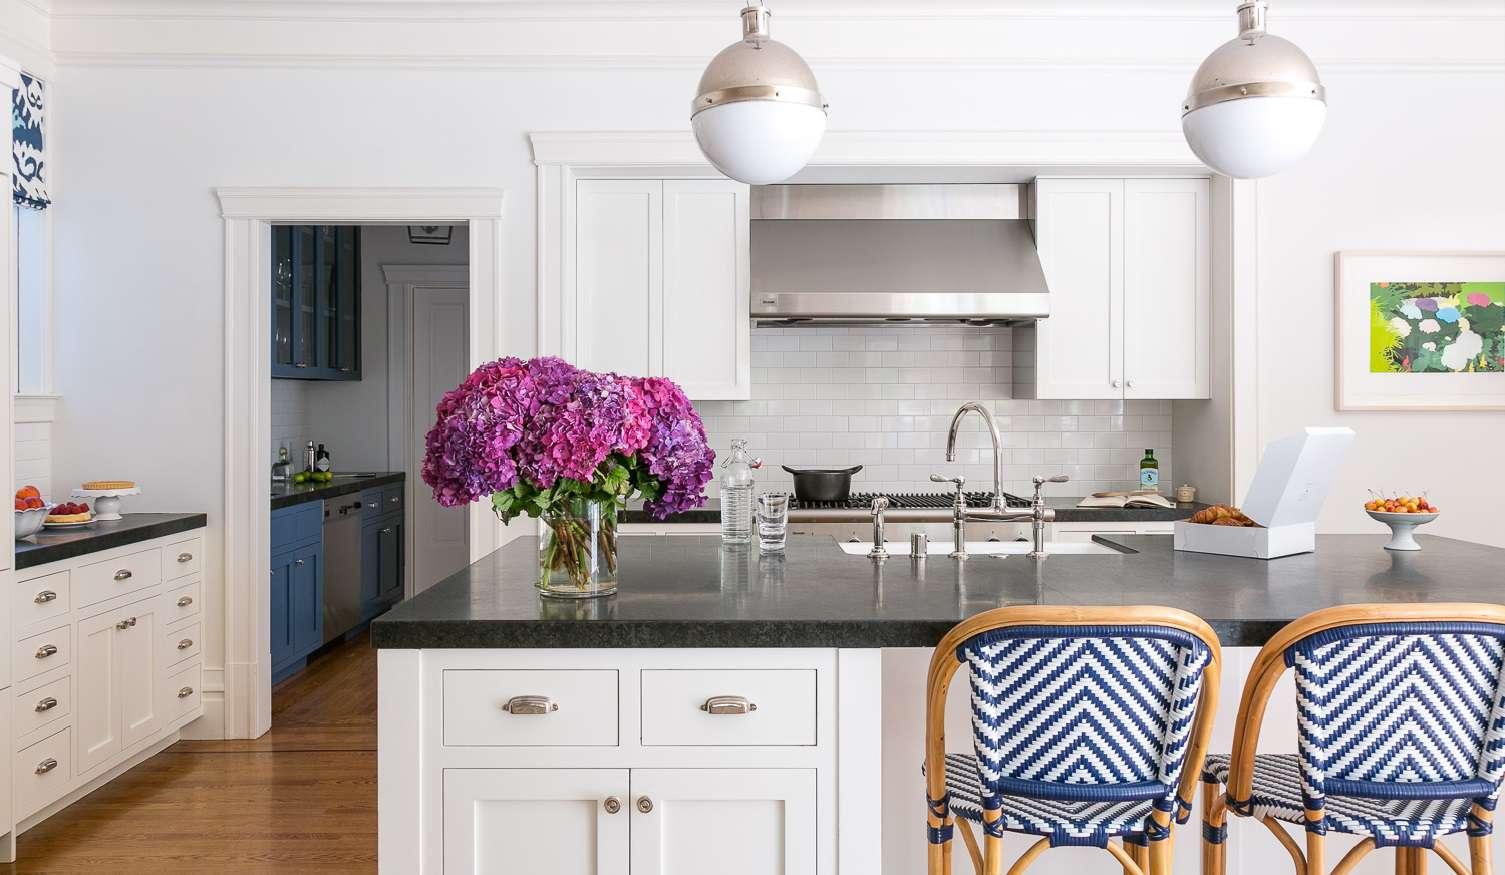 Cocina blanca brillante con iluminación cromada